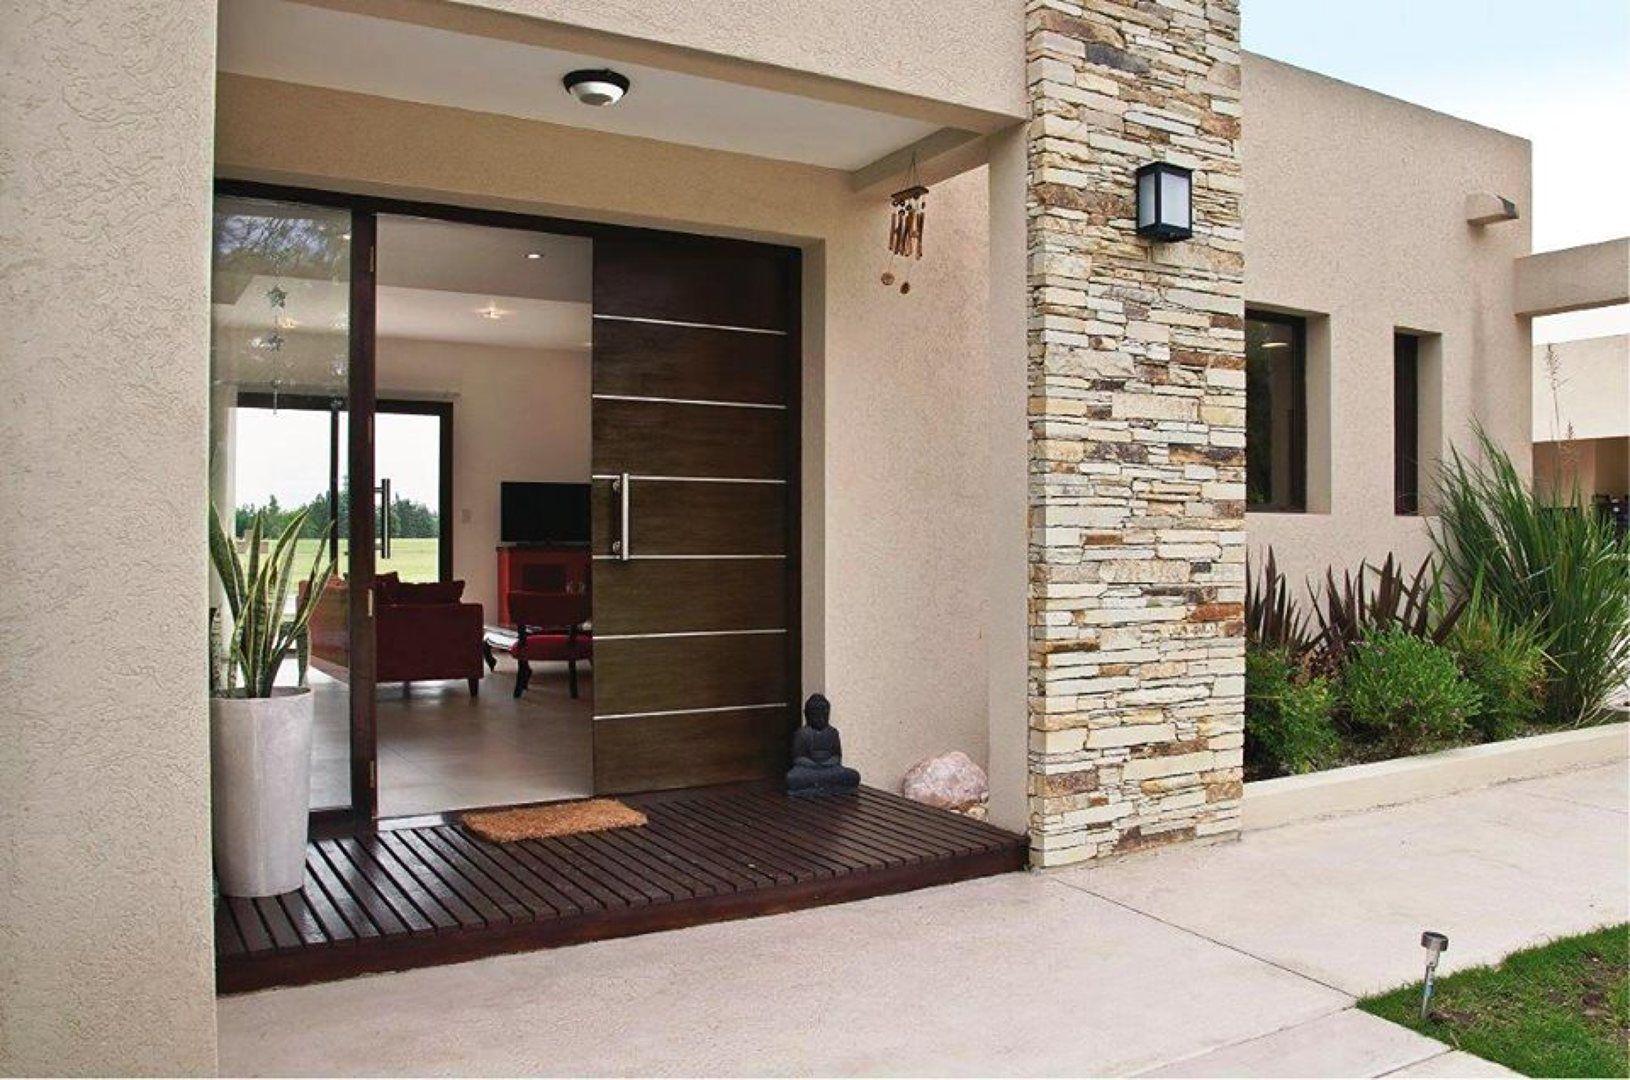 Frente quinchos y piscinas casas casas peque as y for Disenos de frentes de casas modernas